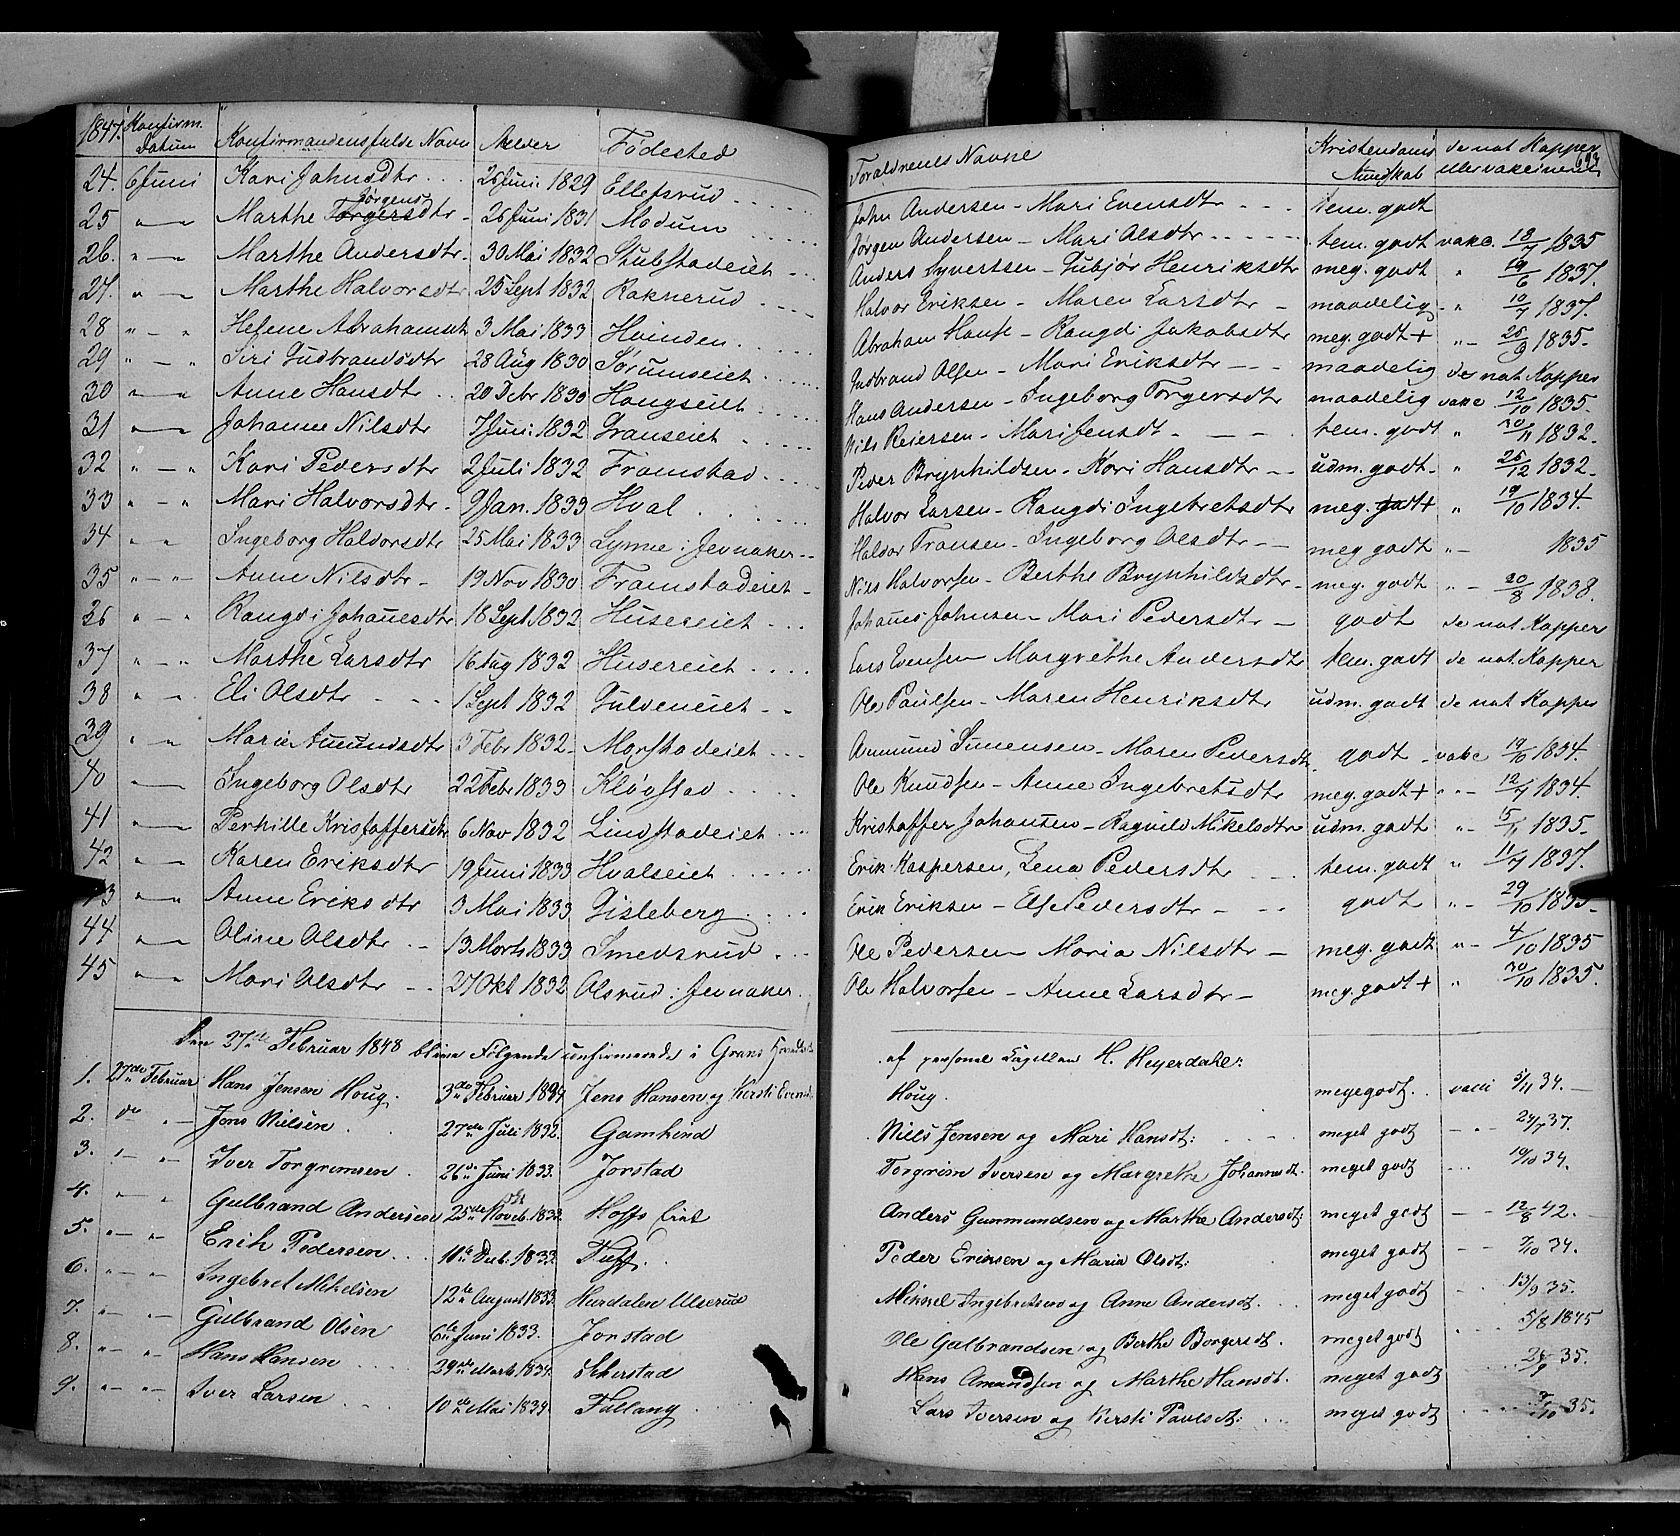 SAH, Gran prestekontor, Ministerialbok nr. 11, 1842-1856, s. 692-693